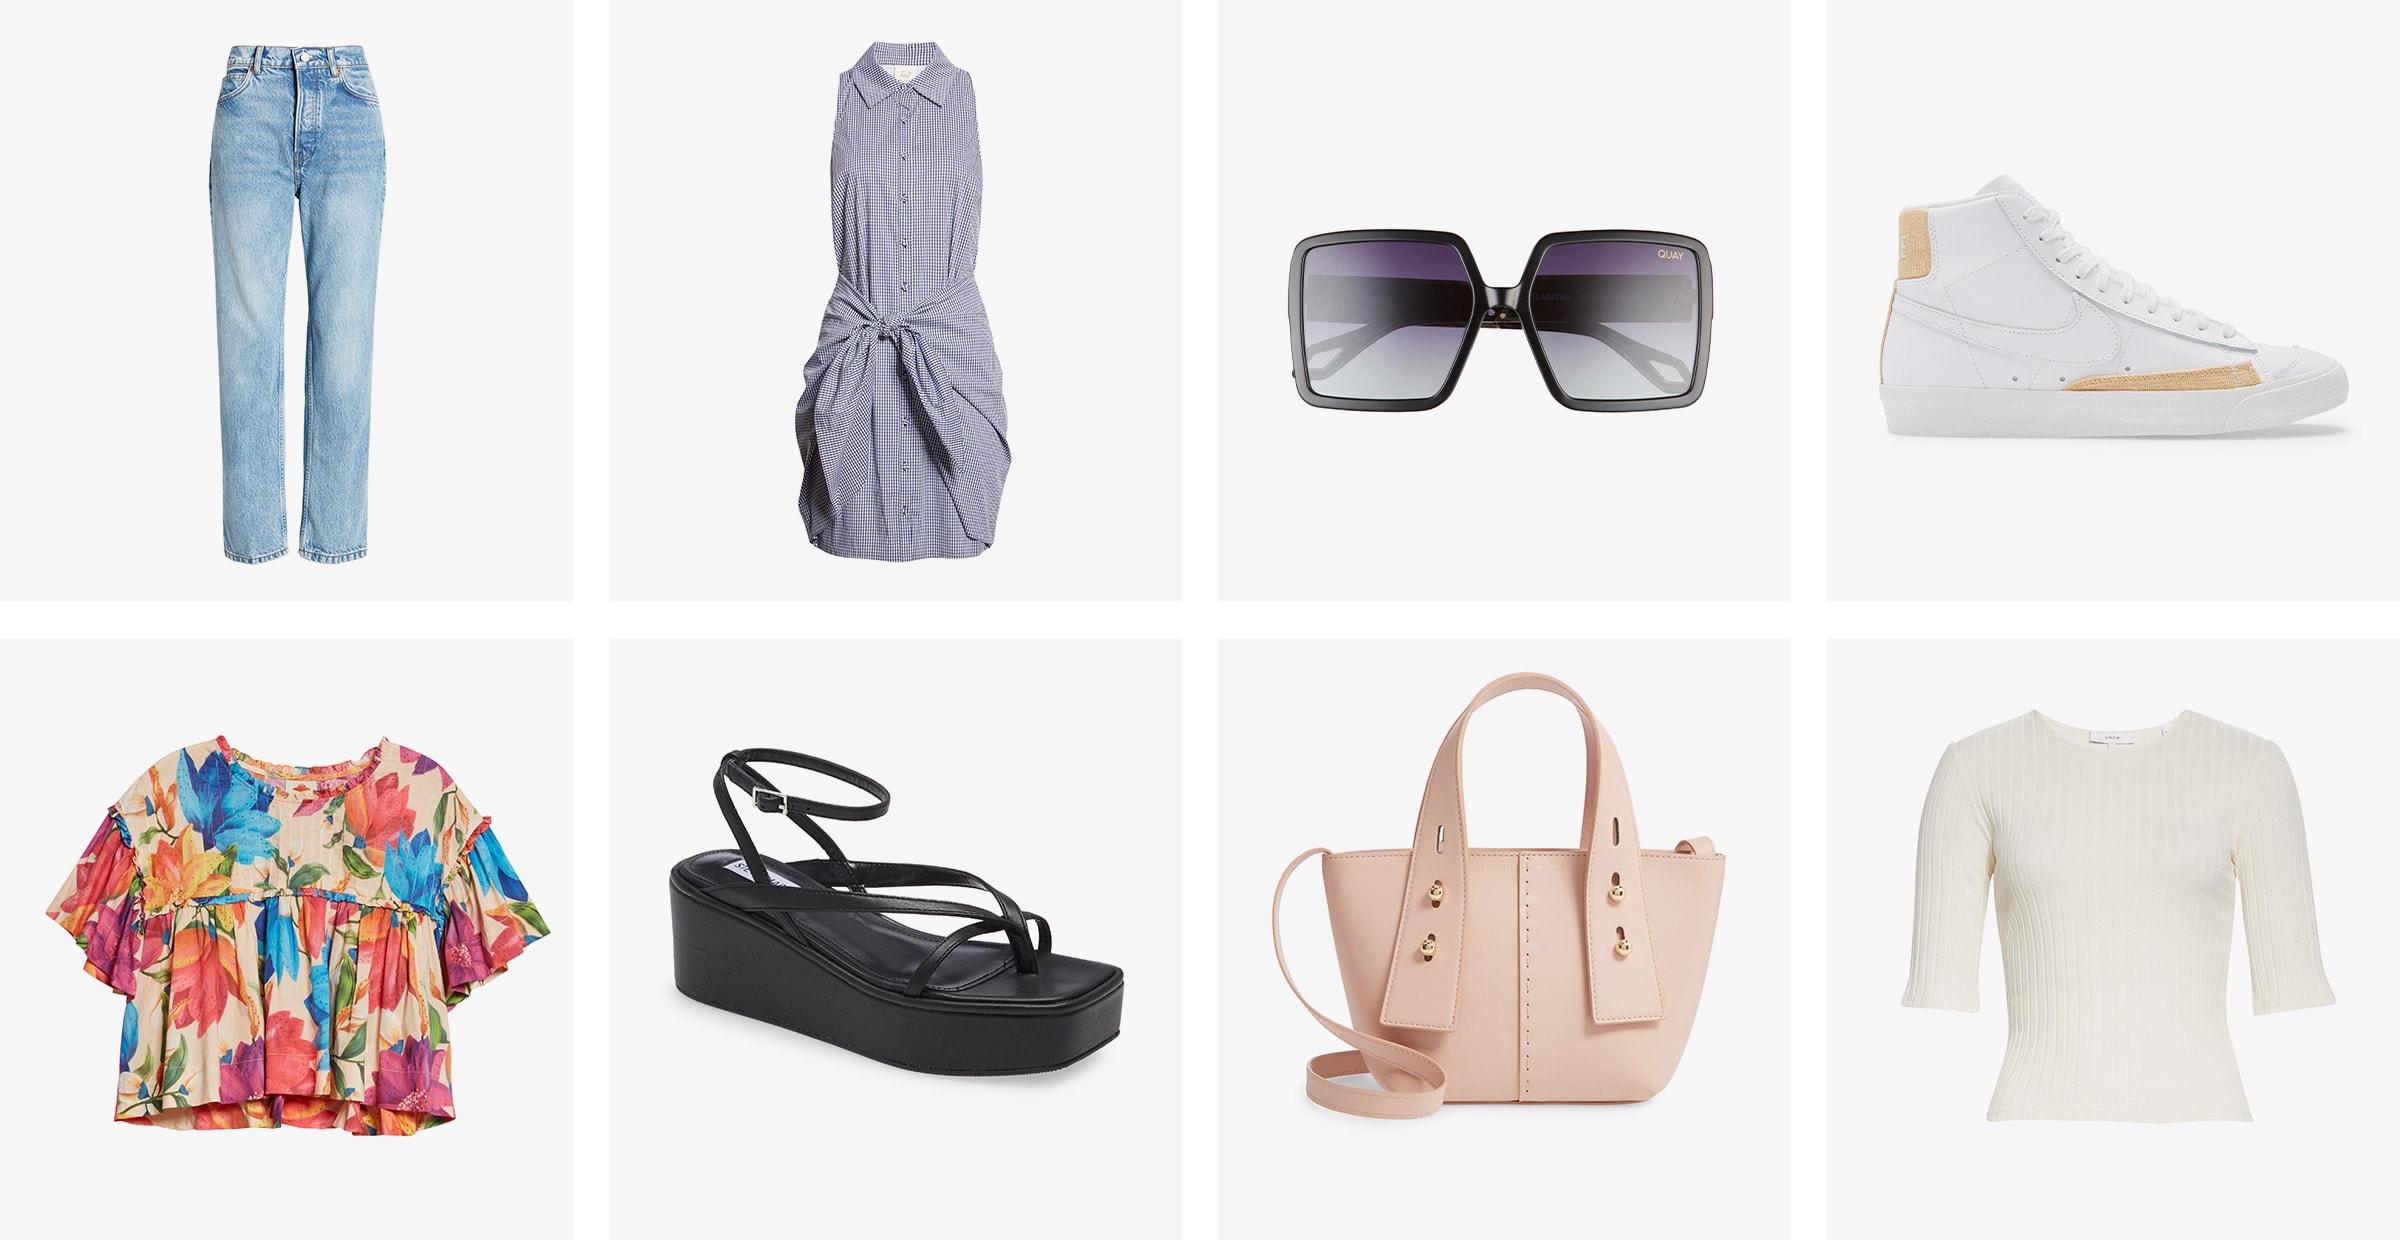 Women's jeans, shirtdress, sunglasses, sneaker, cropped top, sandal, handbag and knit top.